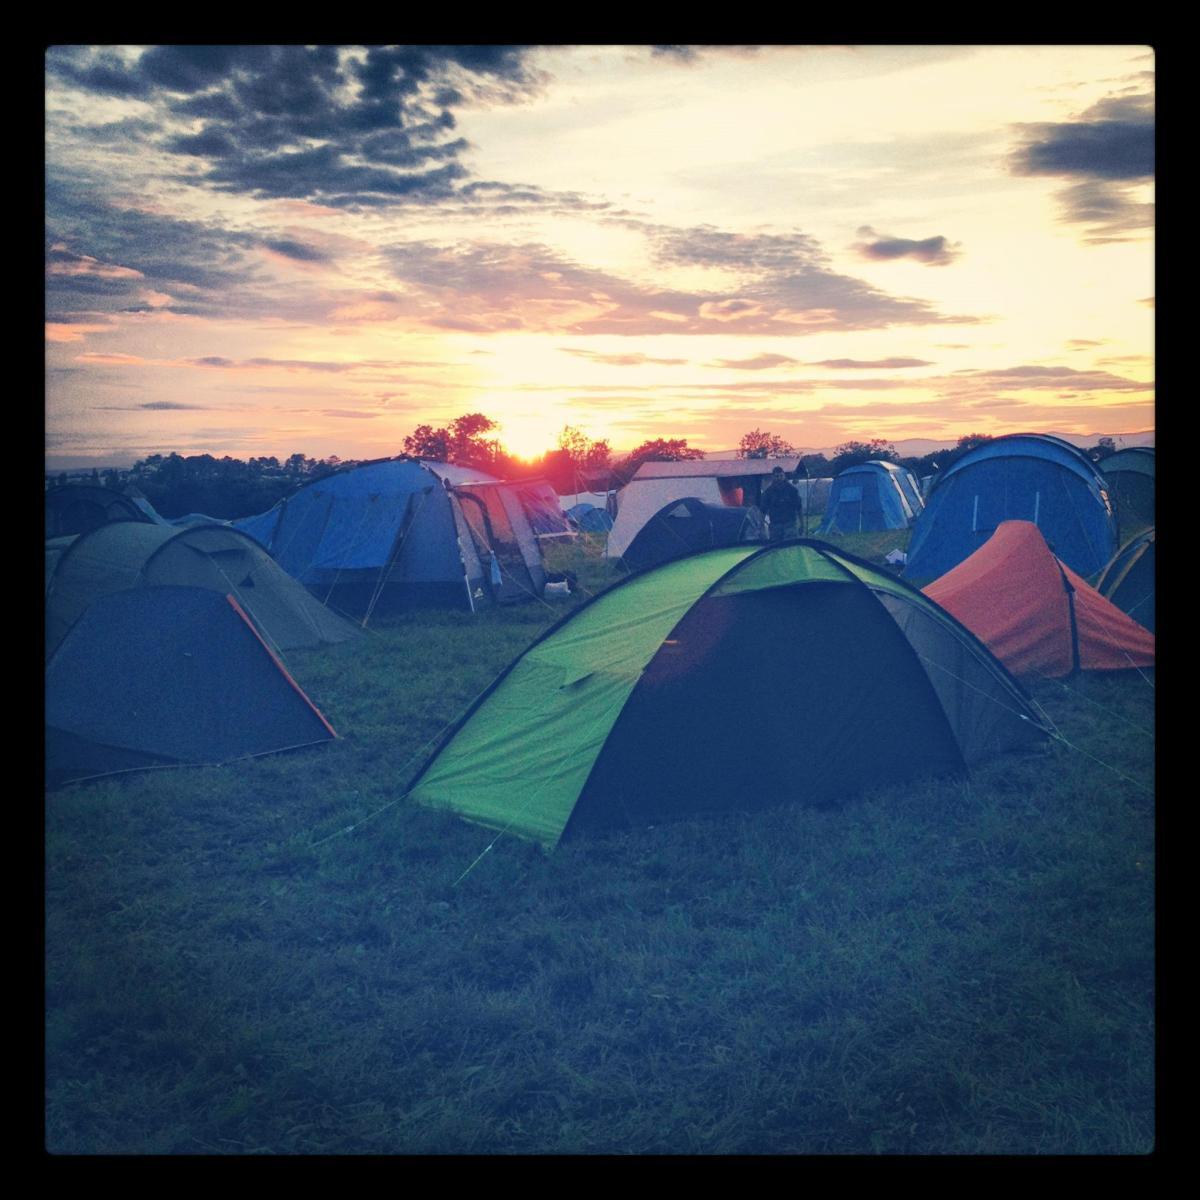 Sunset on Sunday at Greenbelt 2012 campsite